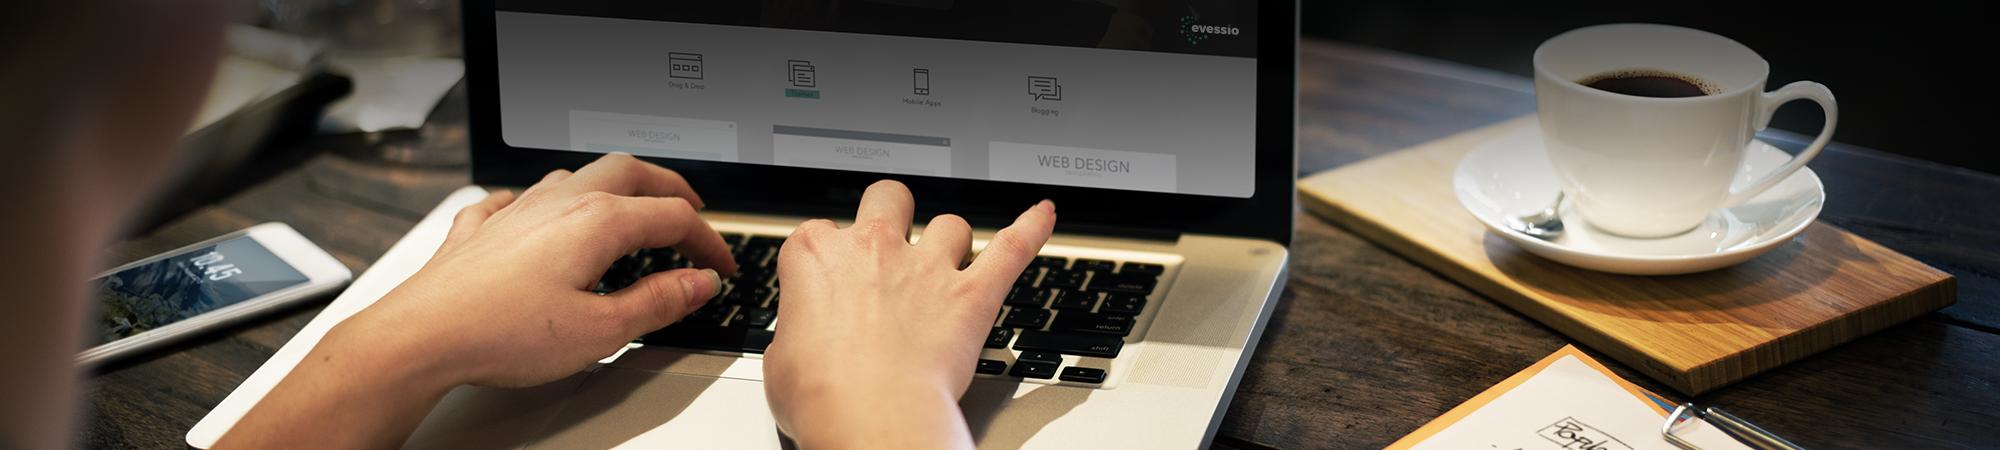 Evessio Webinars